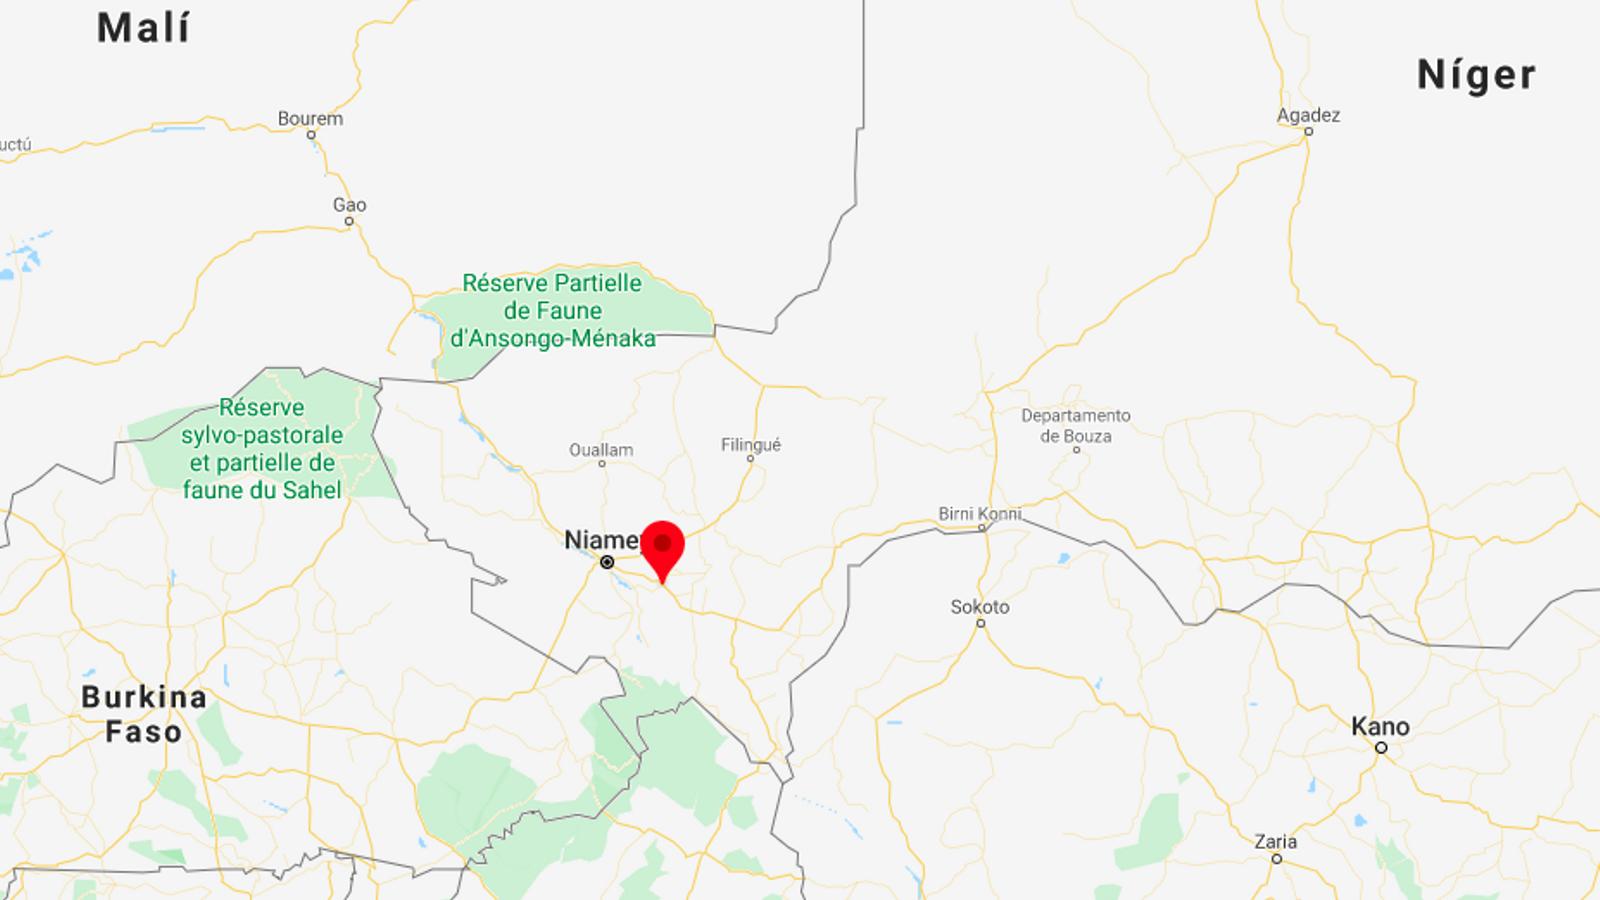 El punt assenyala Kouré, la zona on s'ha produït l'atac